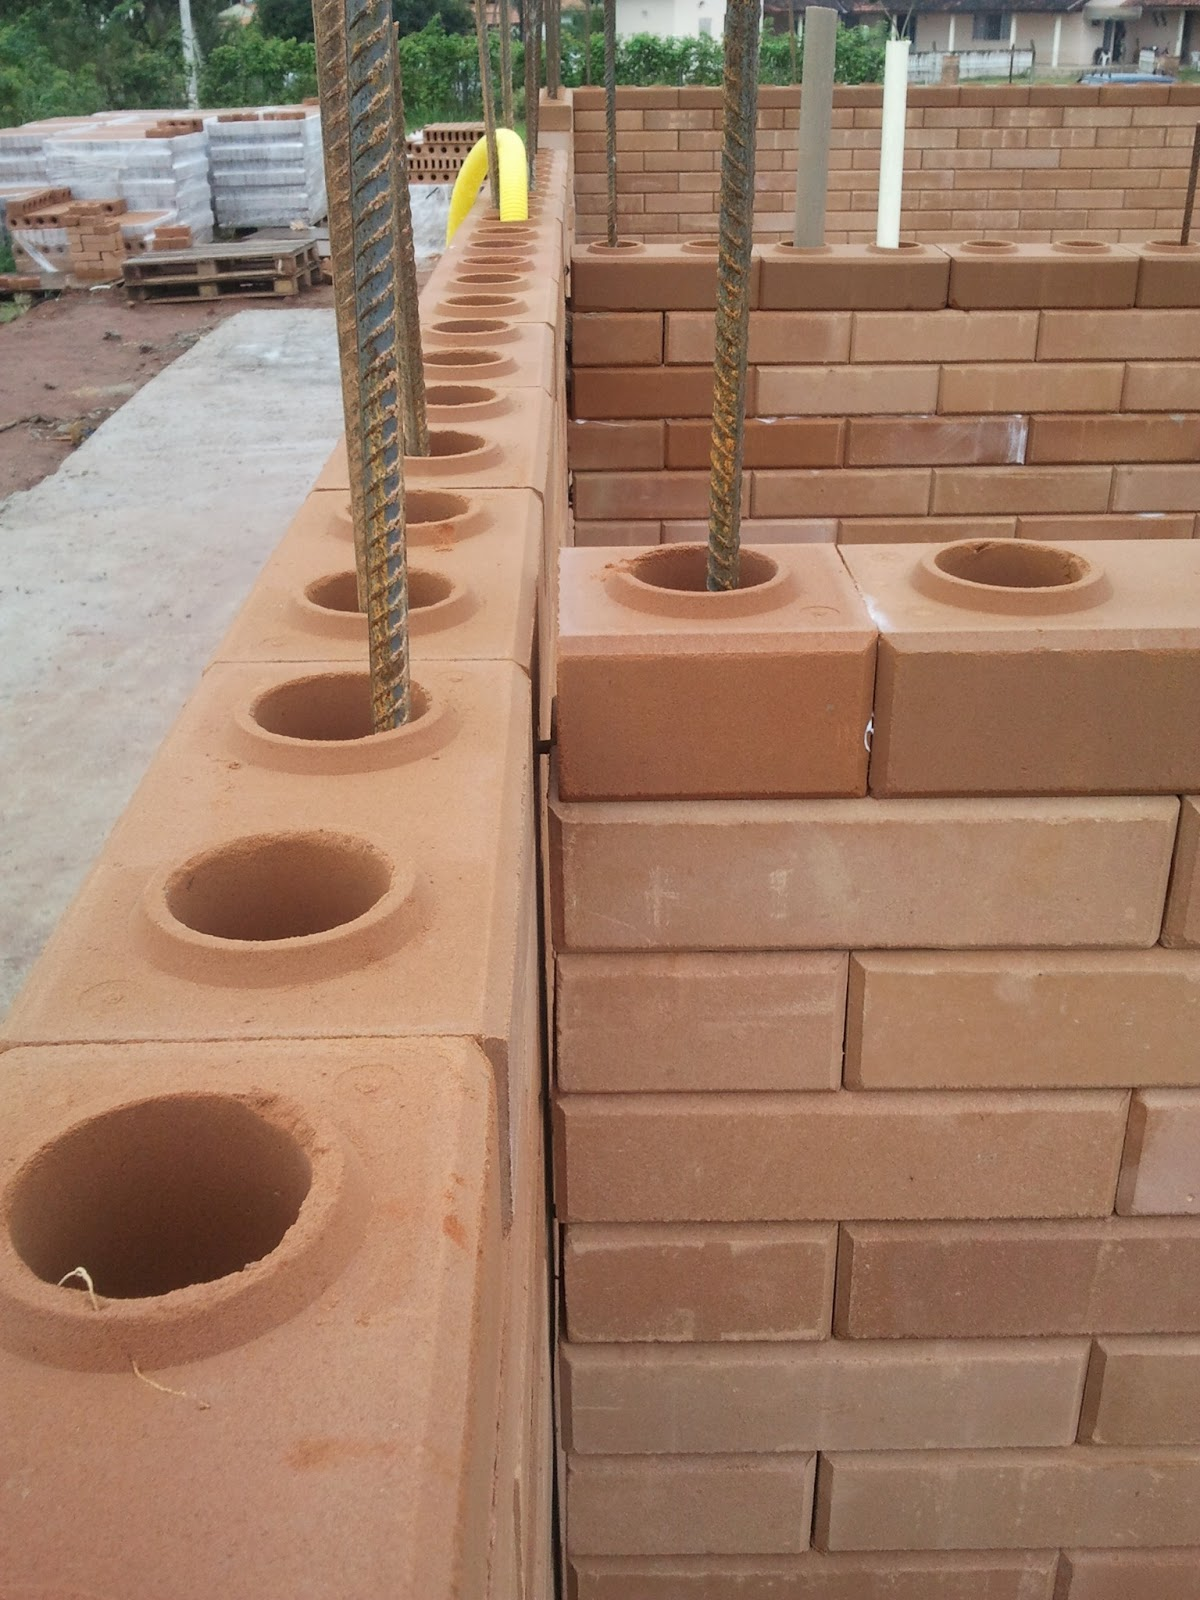 Construindo e Ampliando com Tijolo Solo cimento / Ecológico: Erros #704834 1200x1600 Banheiro Com Tijolo Ecologico